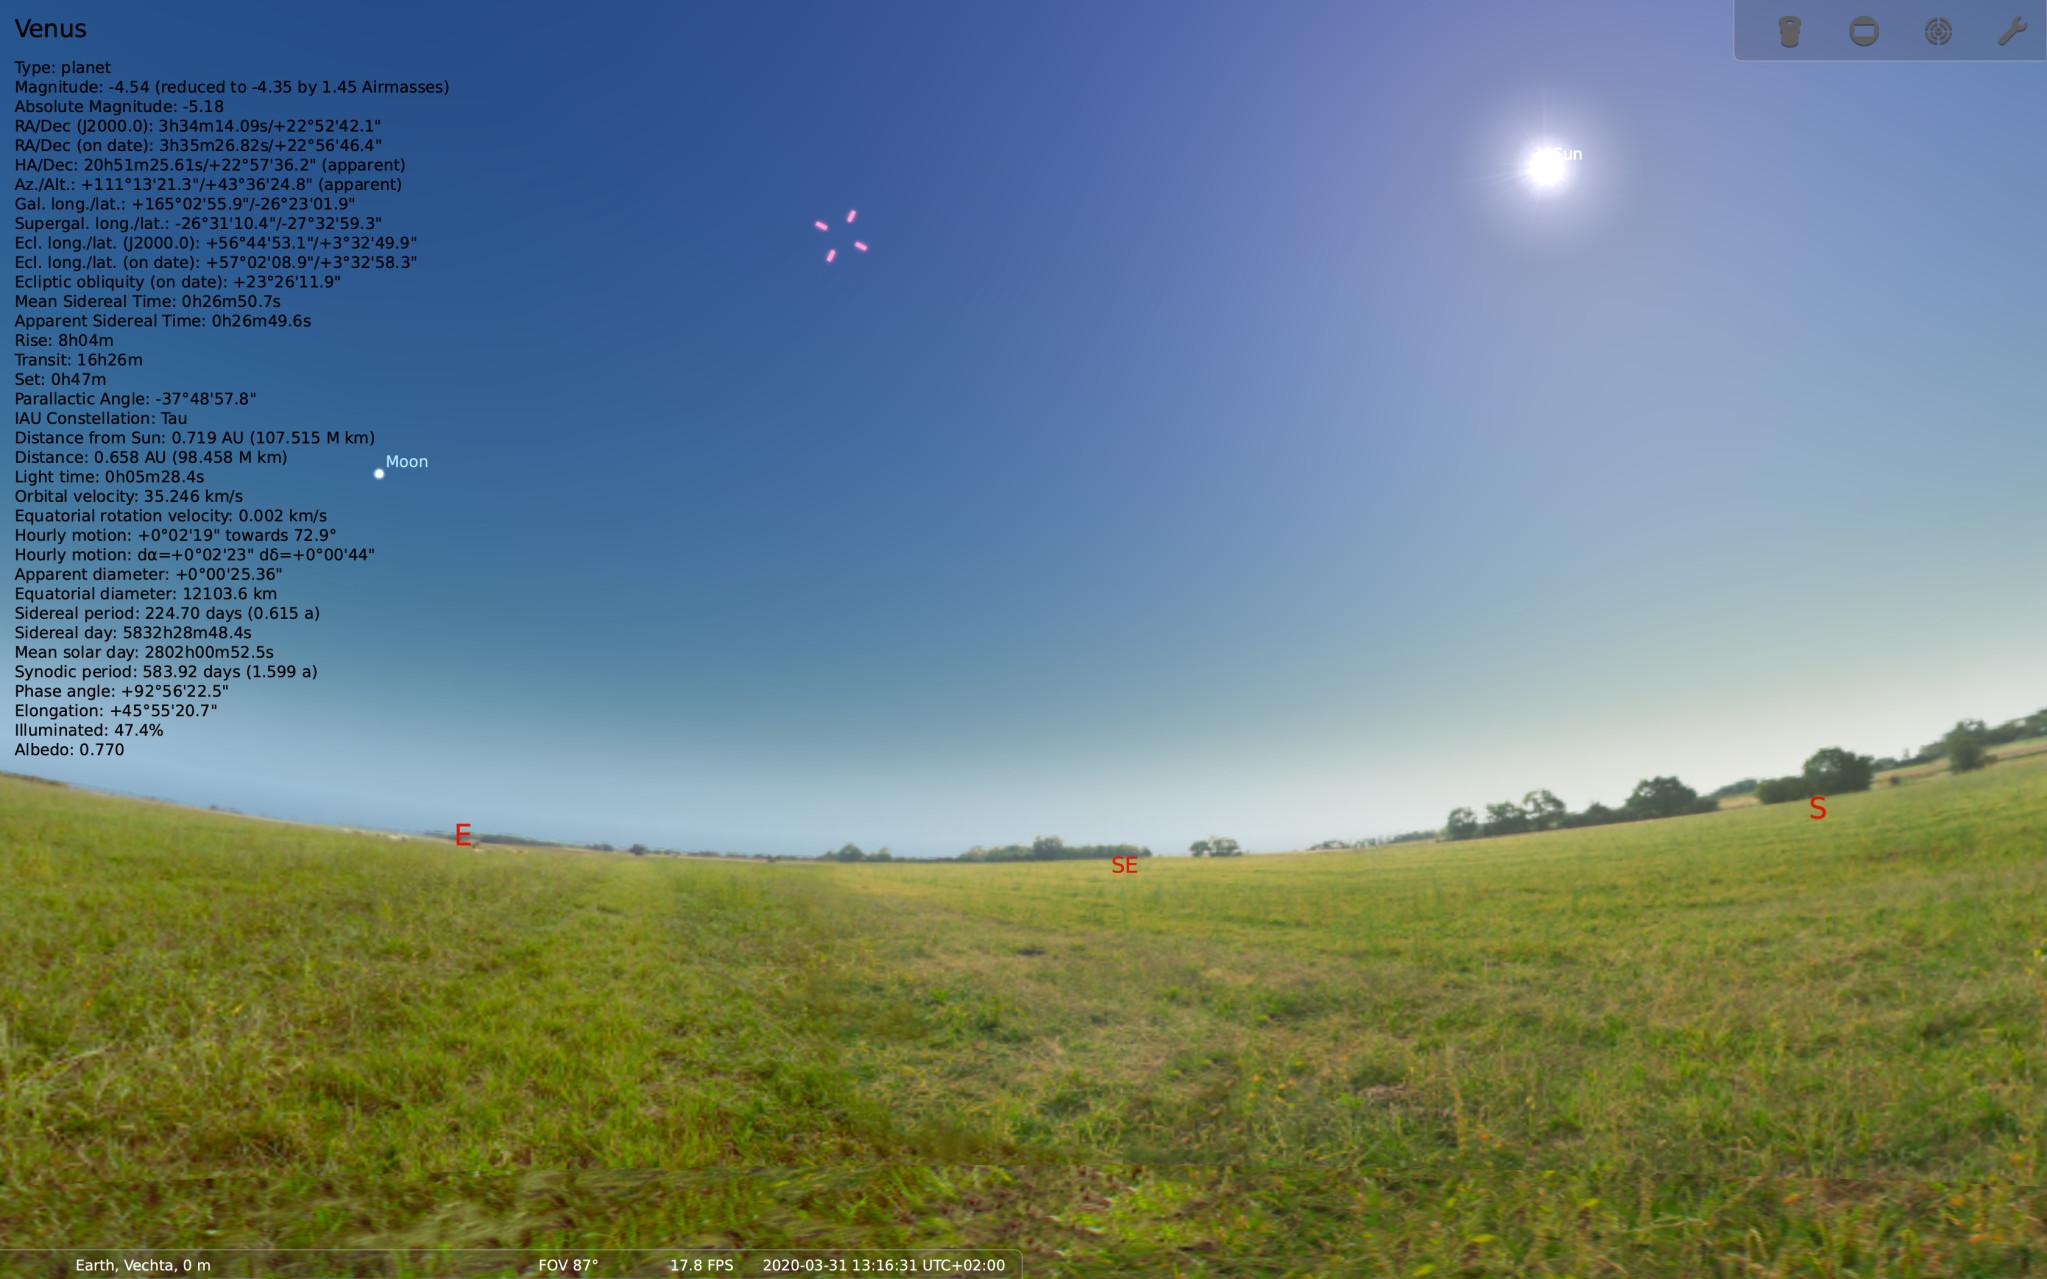 Screenshot 1 - Stellarium (Mac)